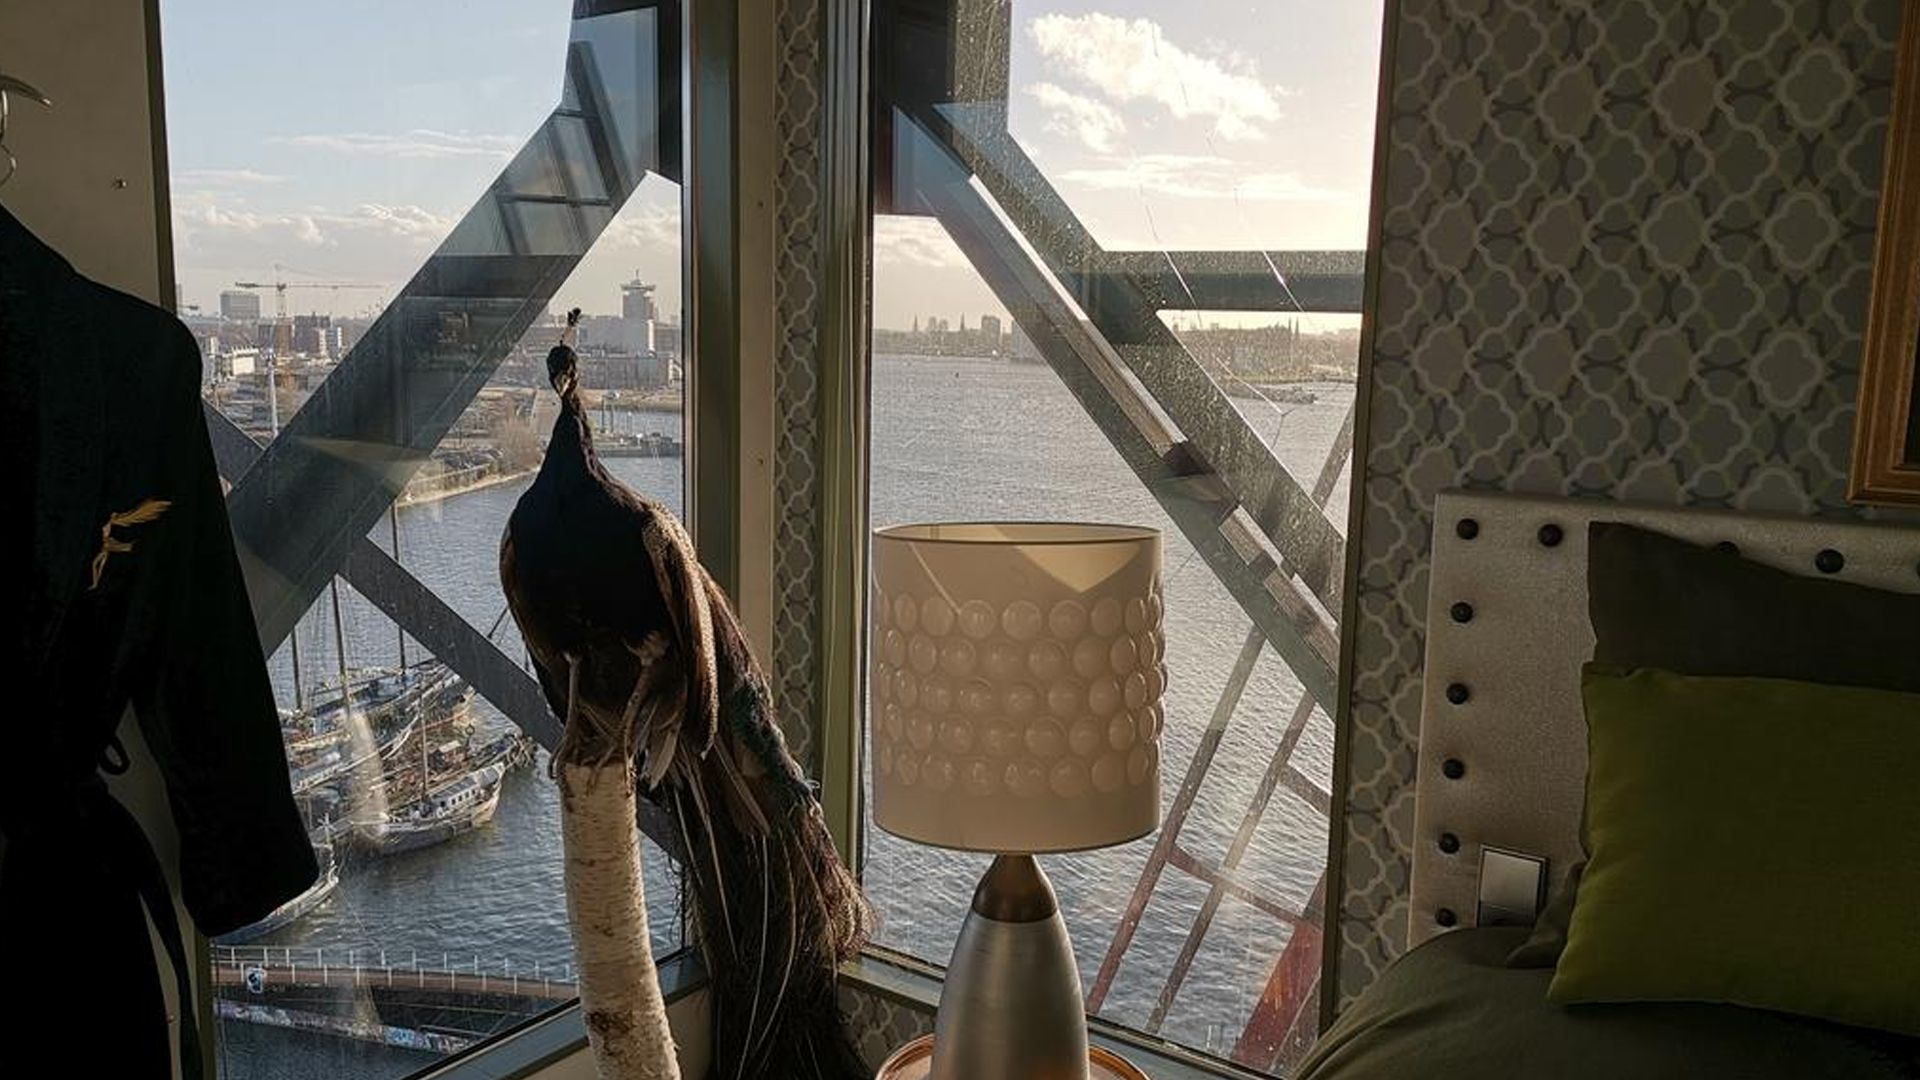 Crane Hotel Faralda Amsterdam